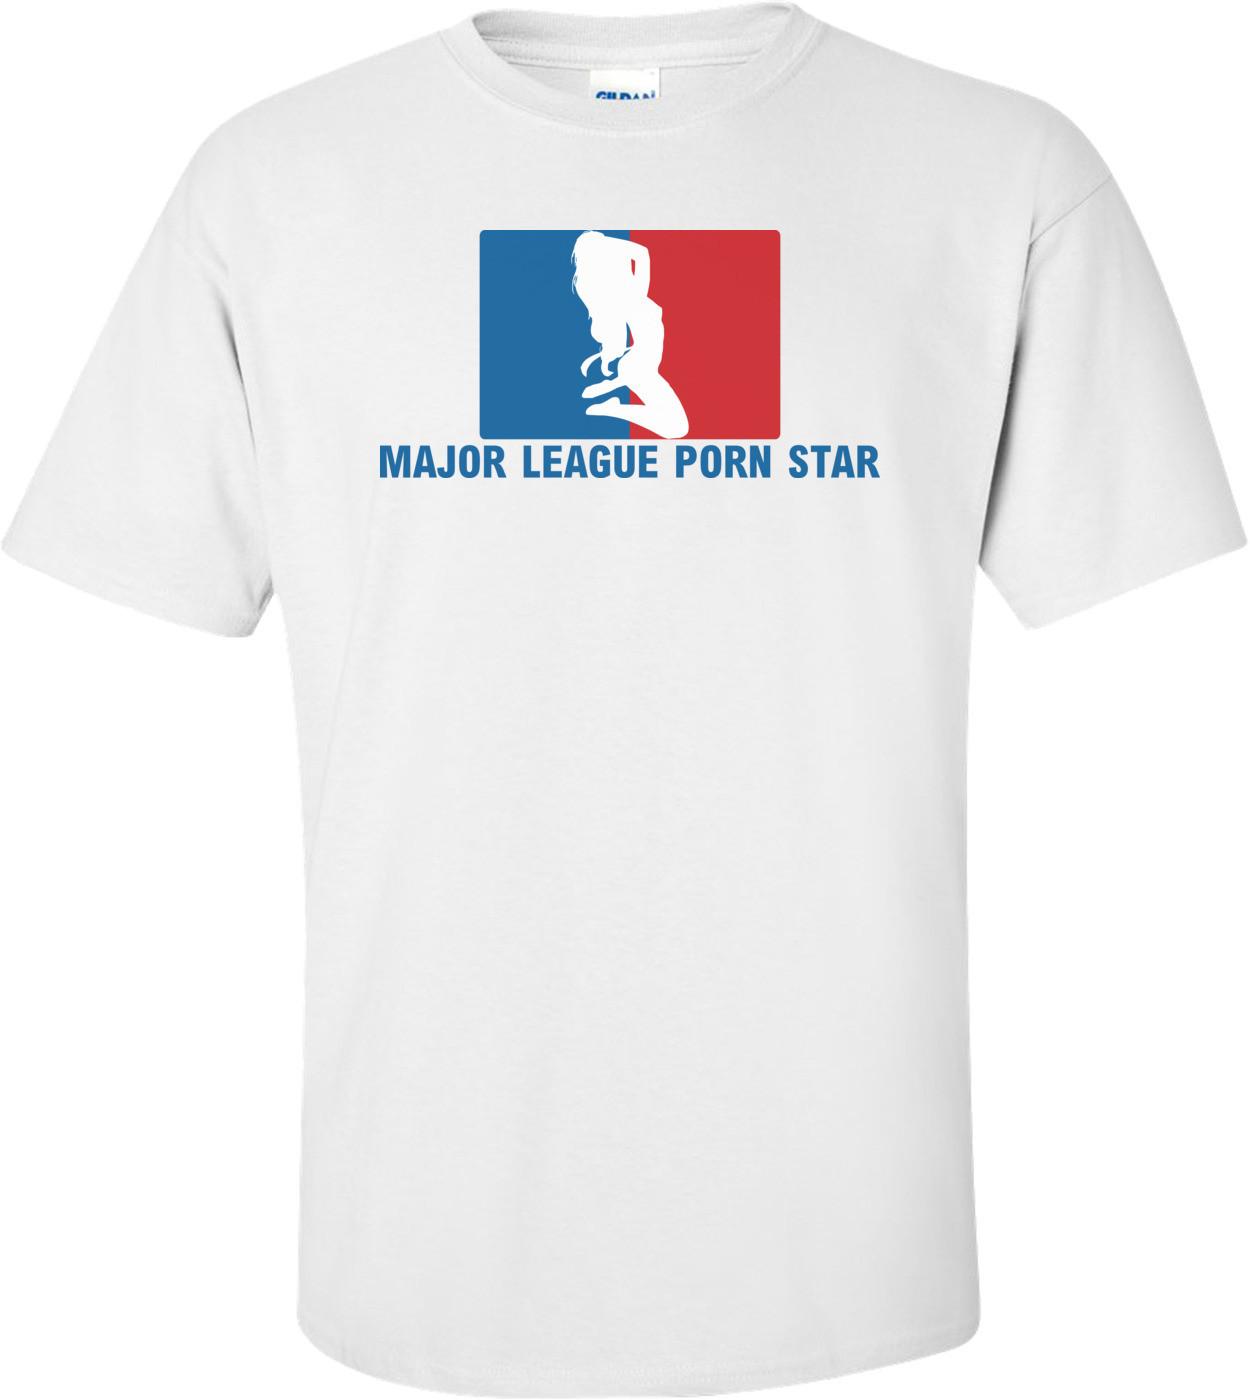 Major League Porn Star T-shirt